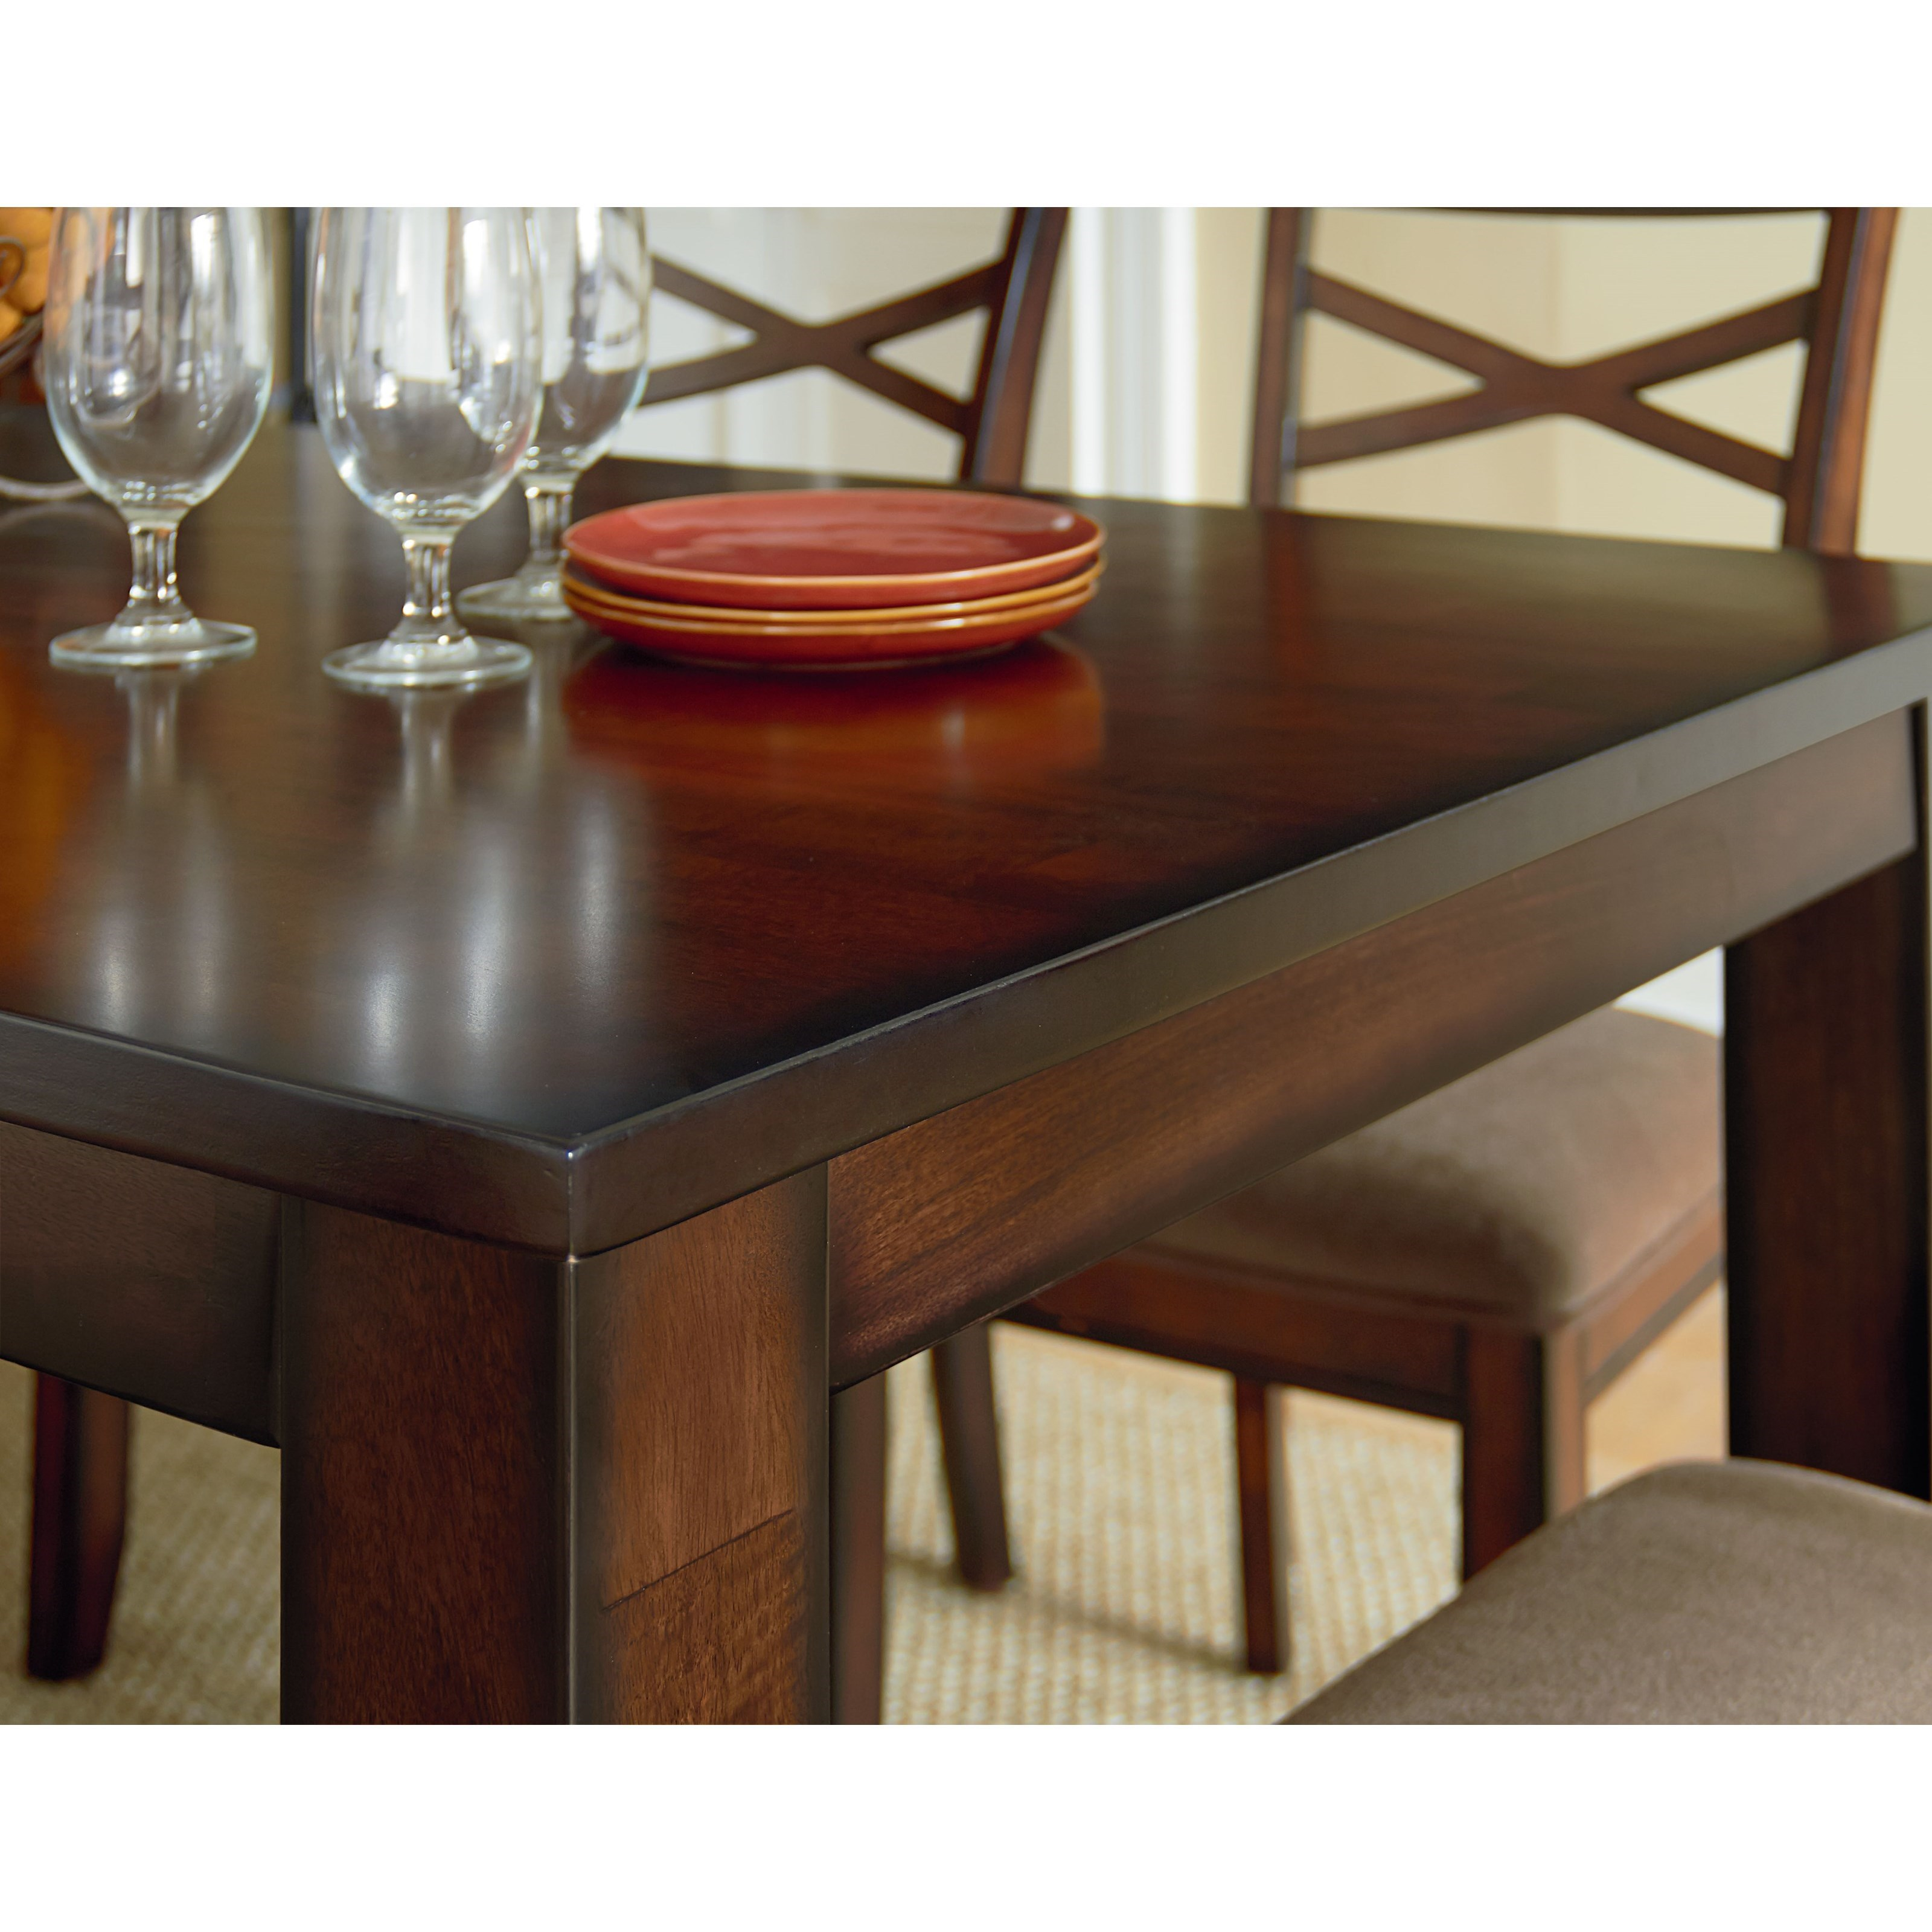 ... Standard Furniture RedondoTable And Chair Set